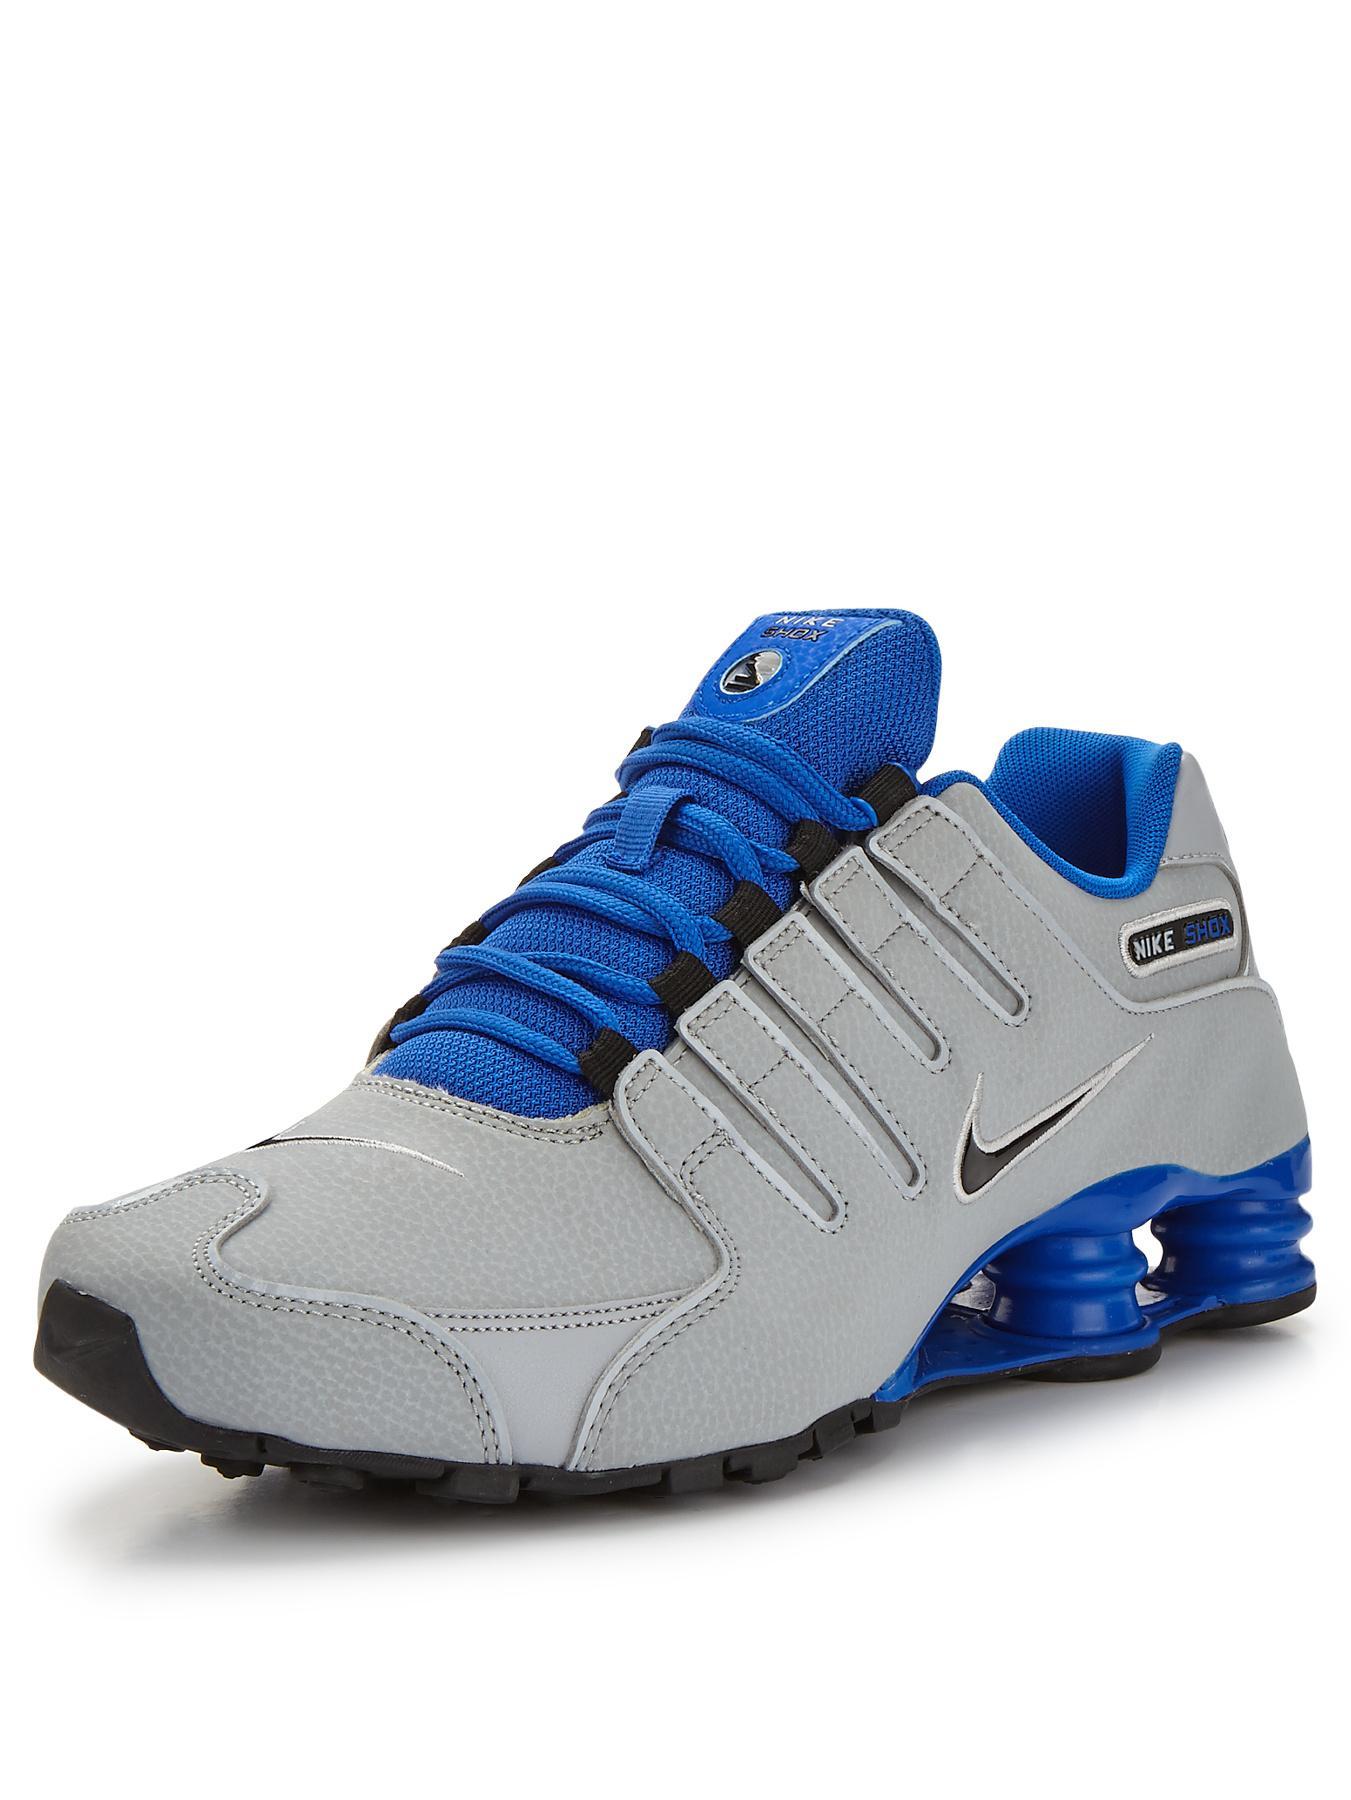 Nike Shox Nz Men's Grey